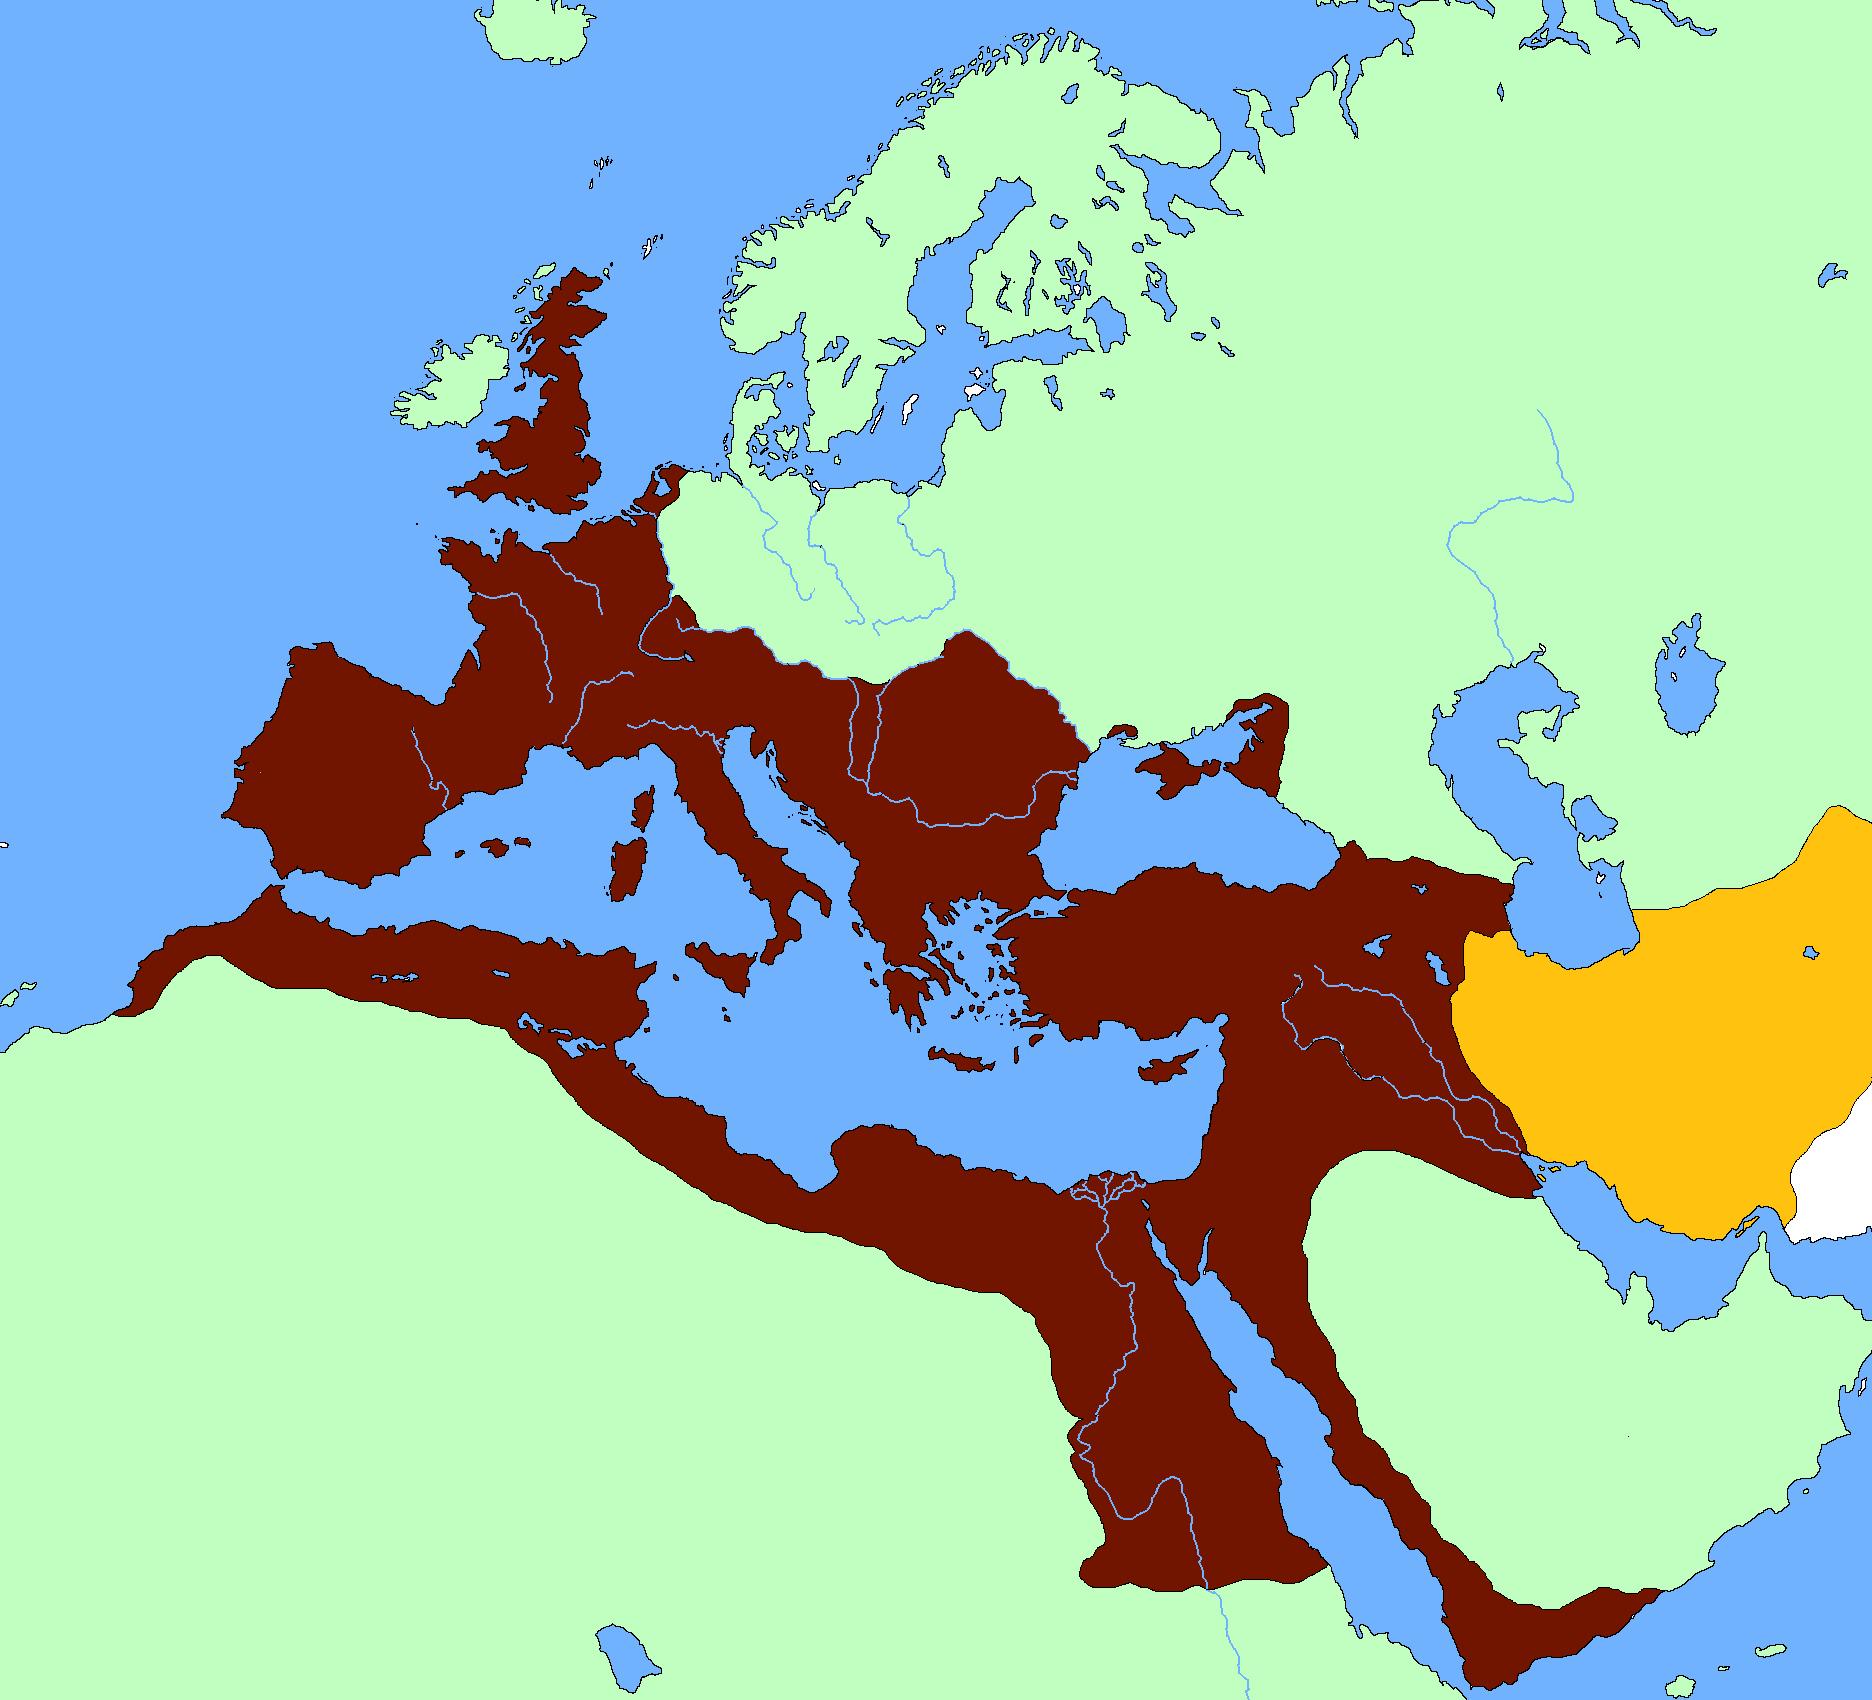 roman empire history - 1023×929